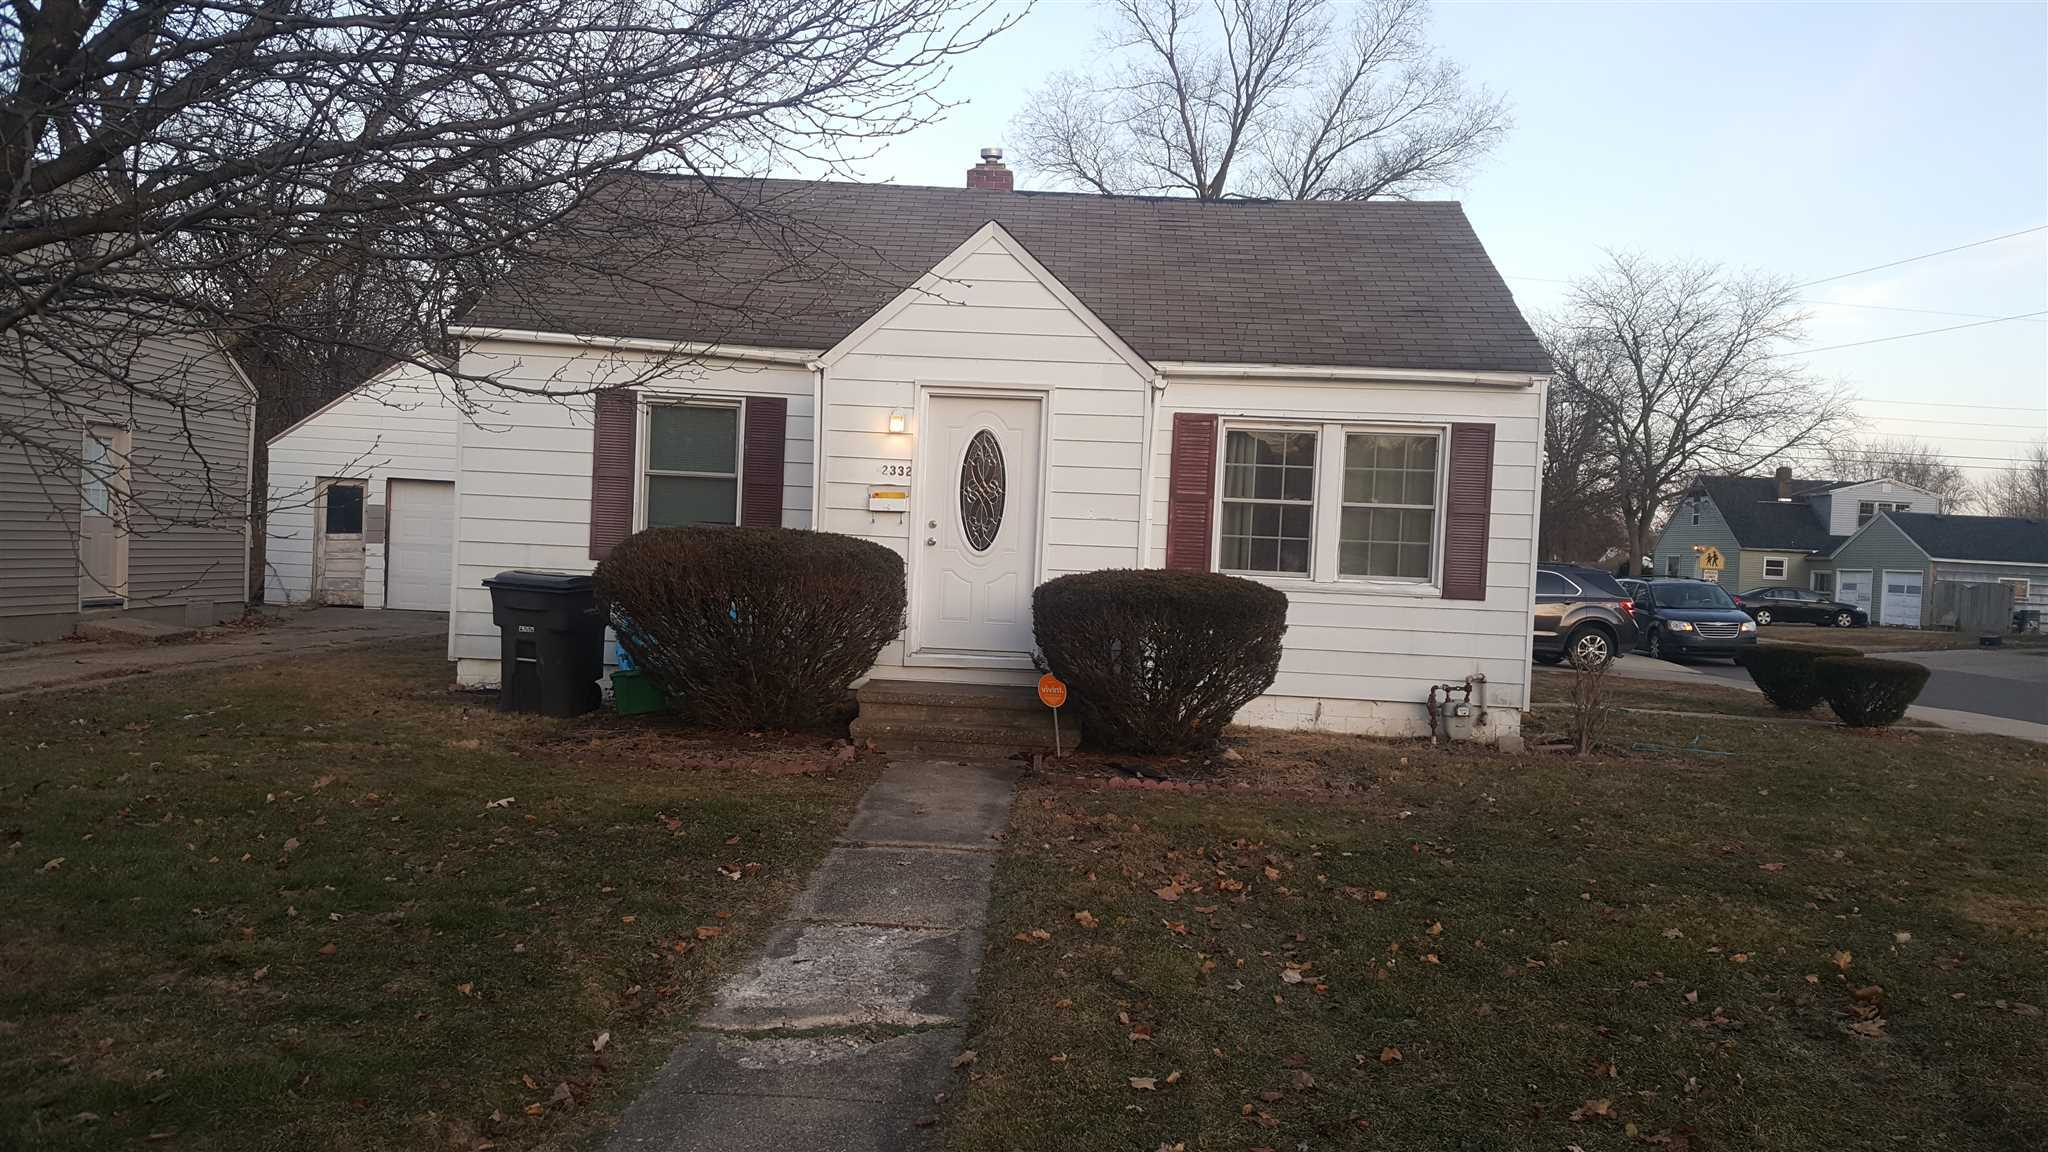 2332 Pleasant Plain Avenue Elkhart,IN 46517 202000871